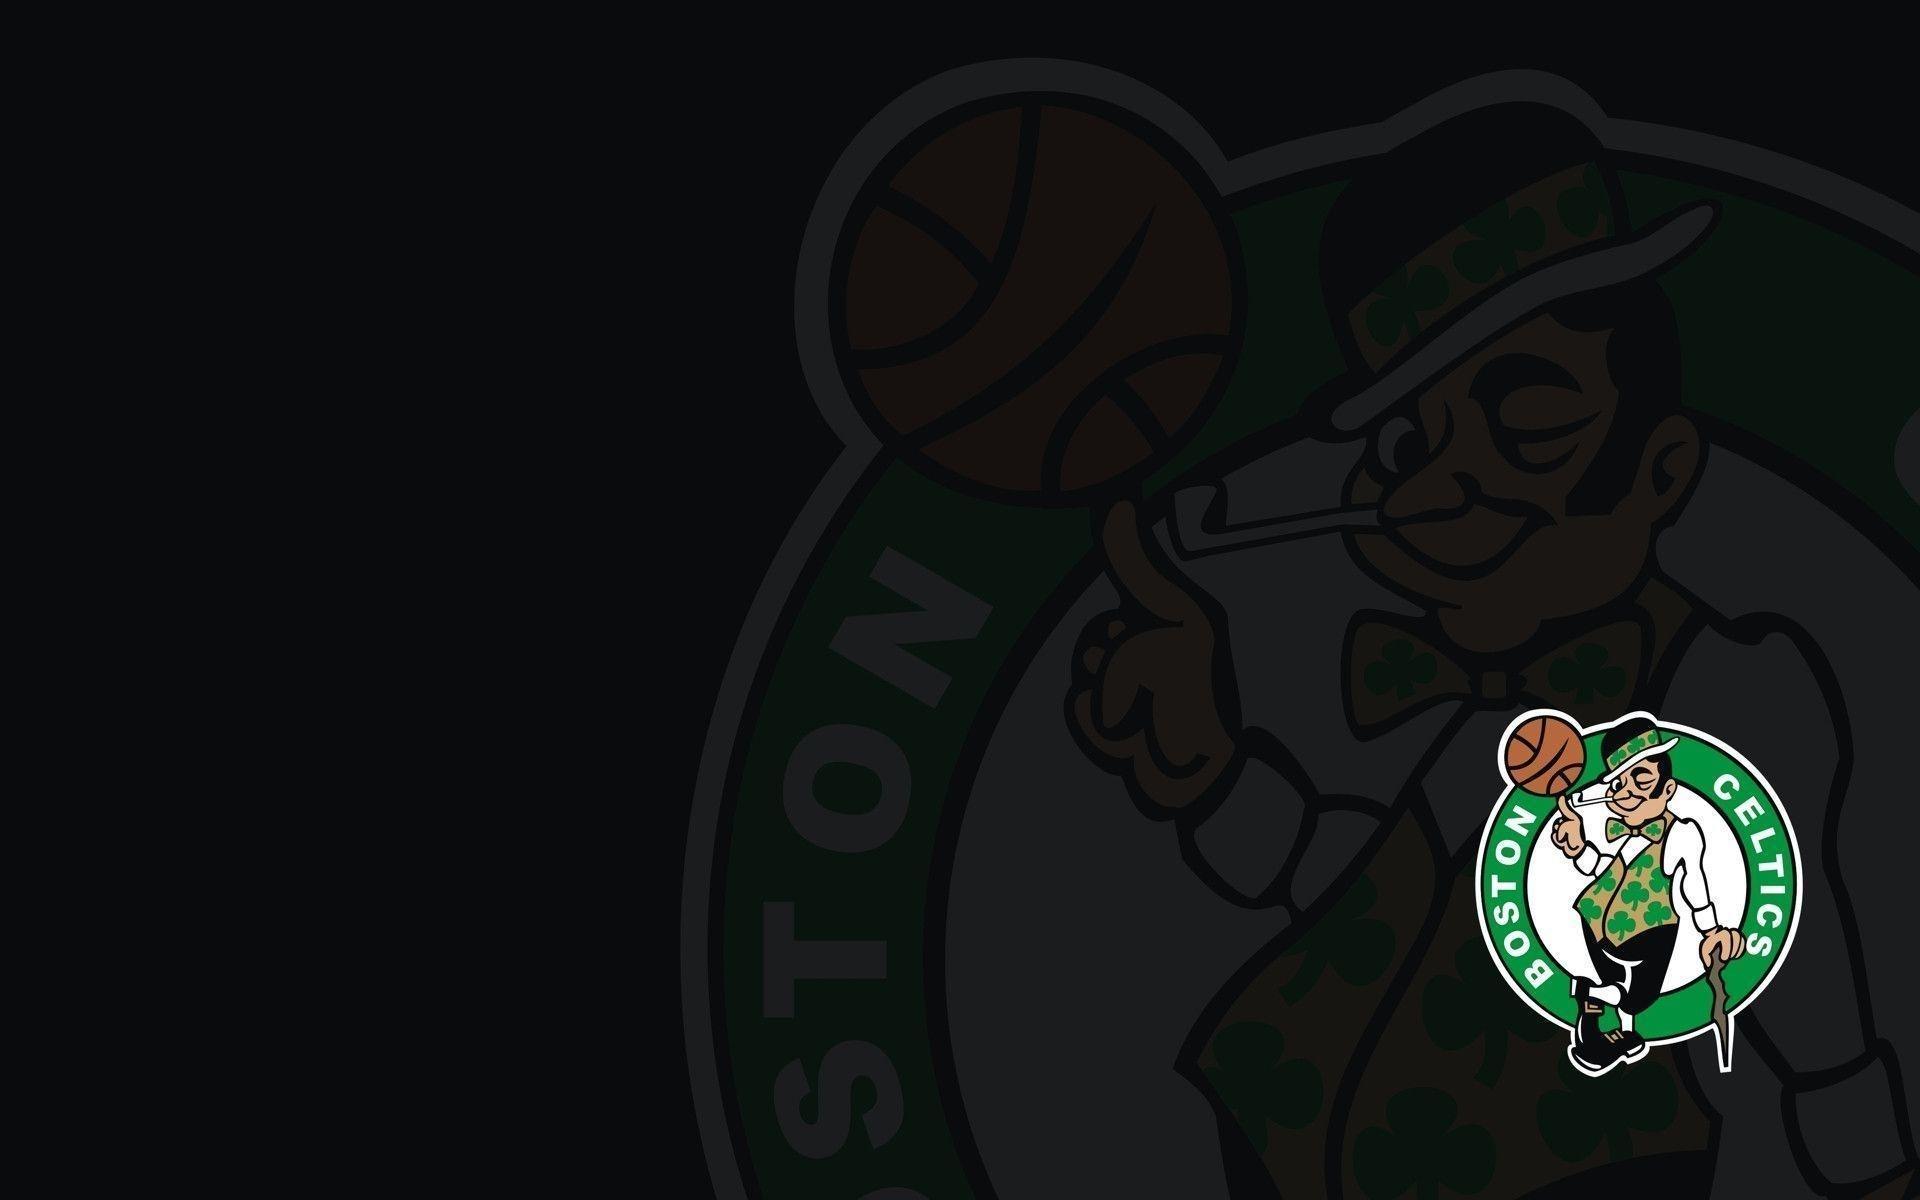 boston celtics wallpapers basketball | pixelstalk